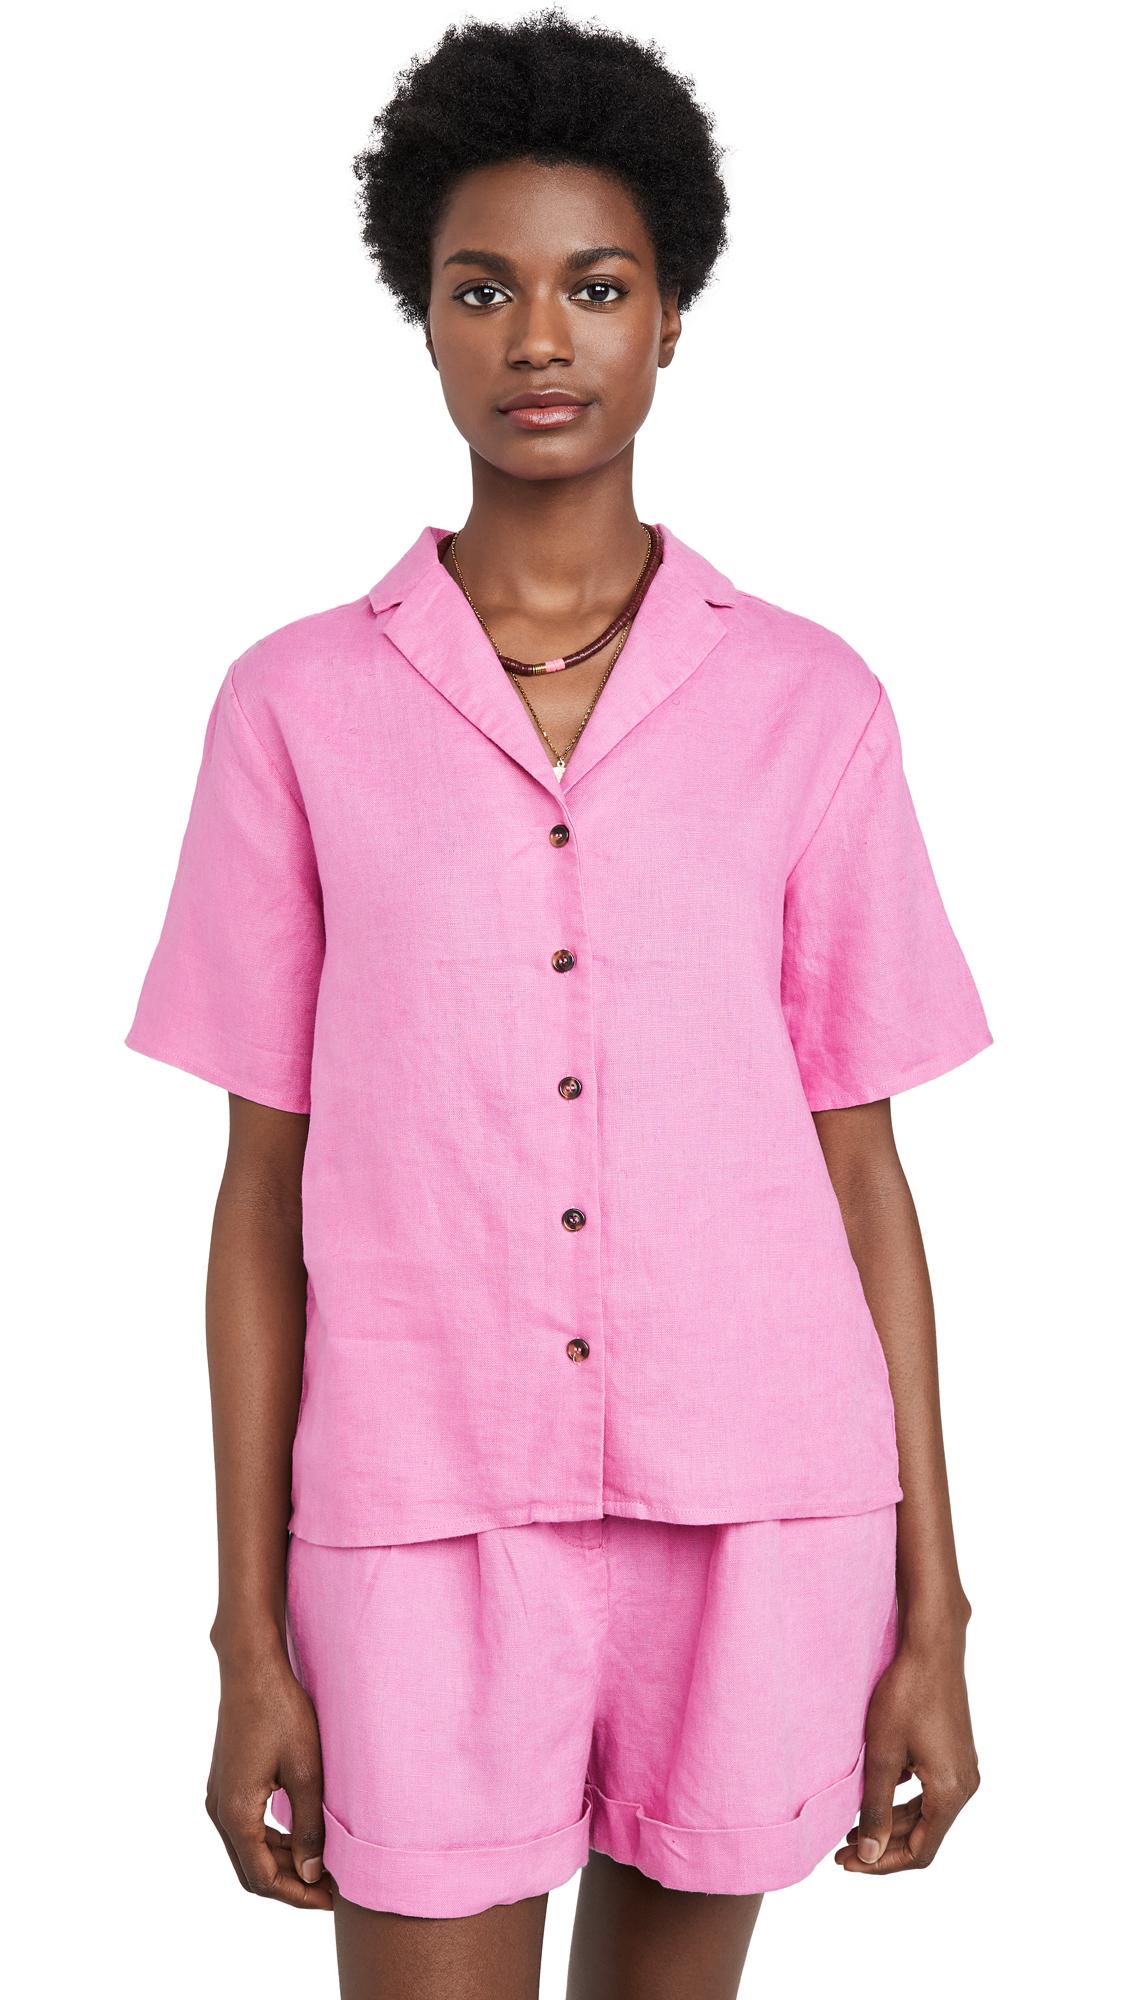 525 Camp Shirt - 30% Off Sale